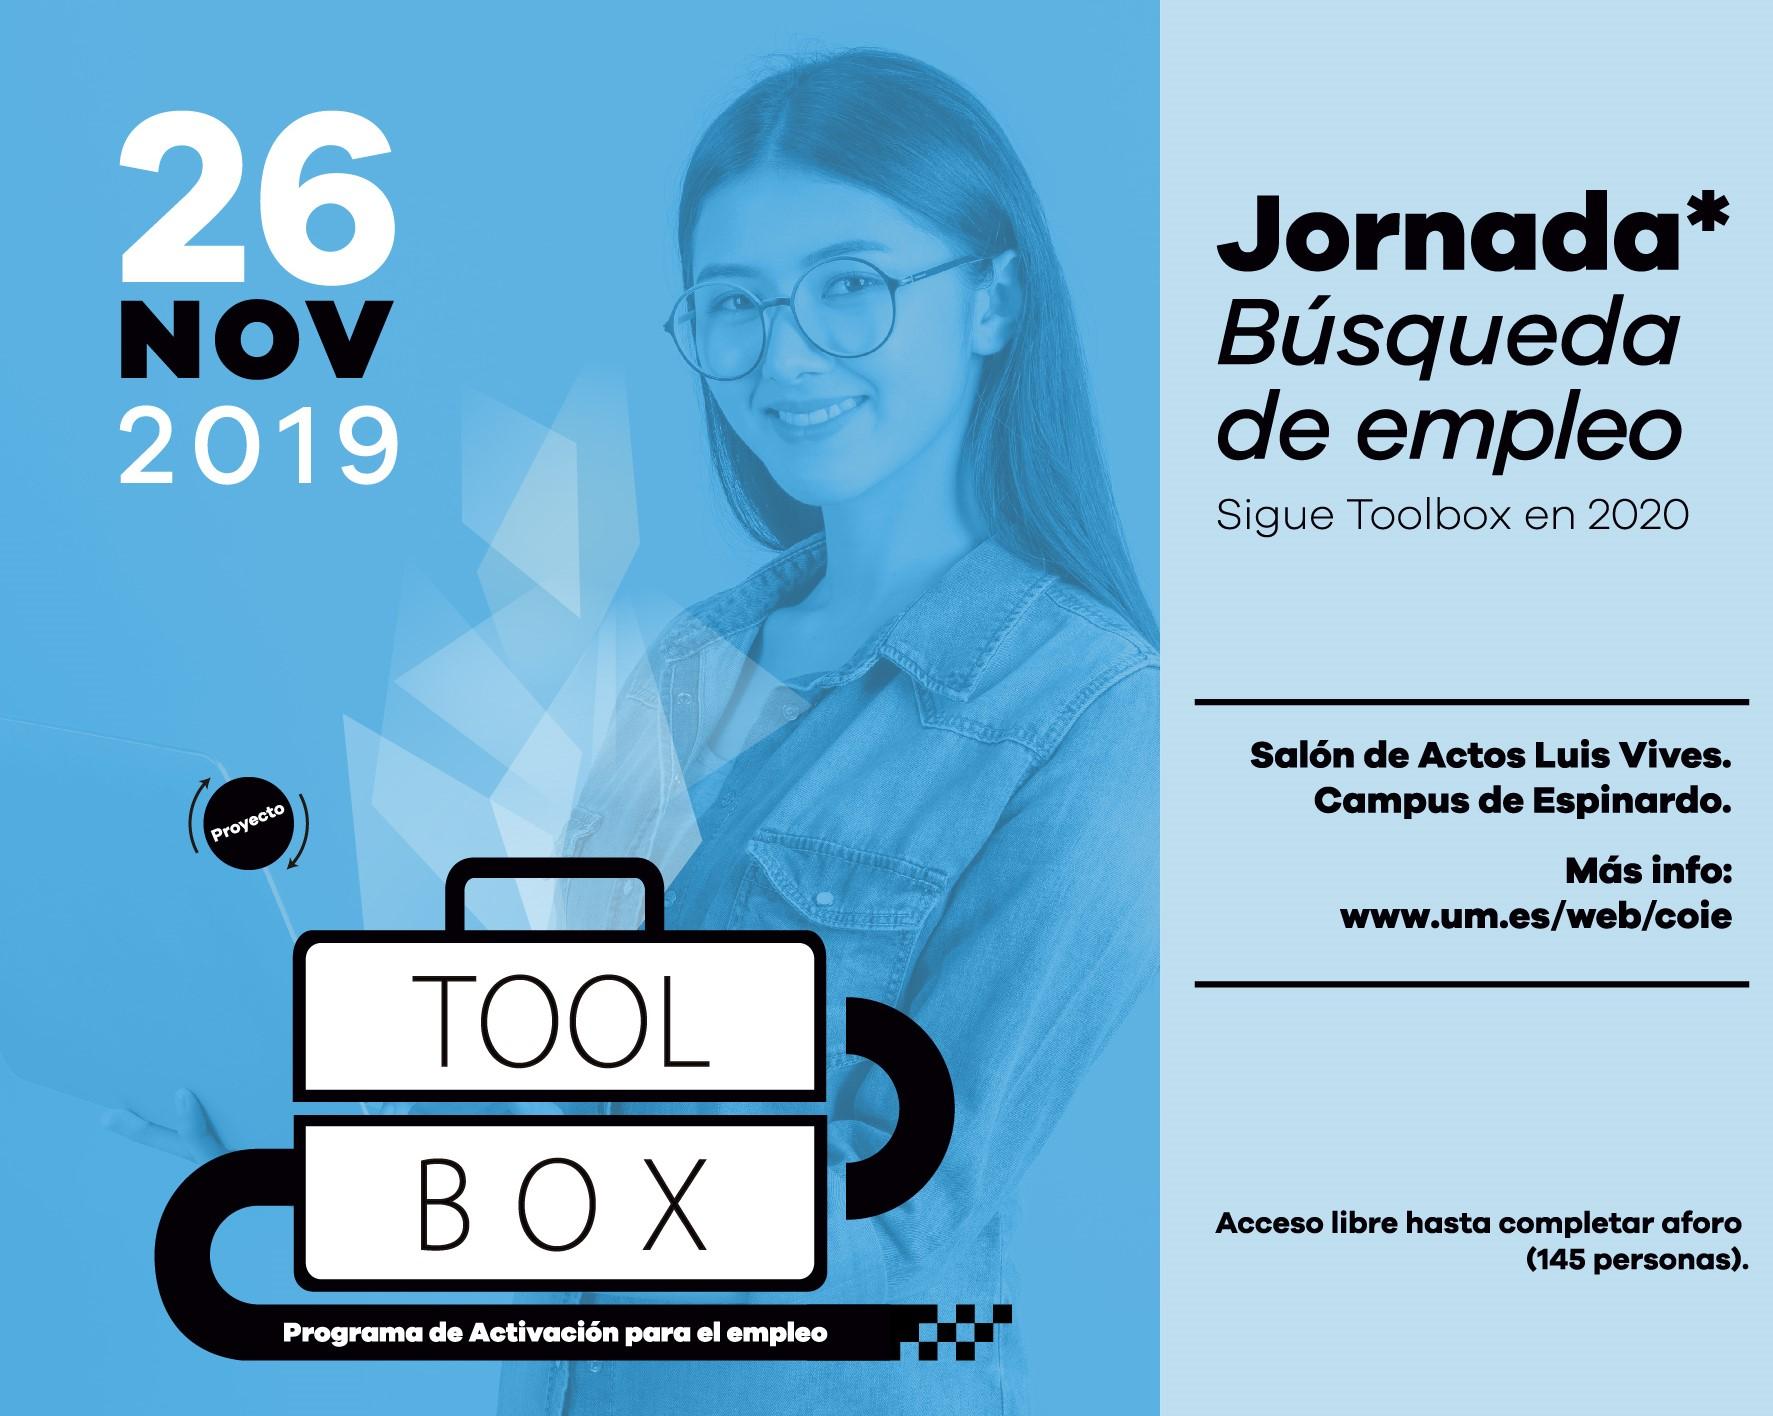 Jornada de búsqueda de empleo. Proyecto TOOLBOX.